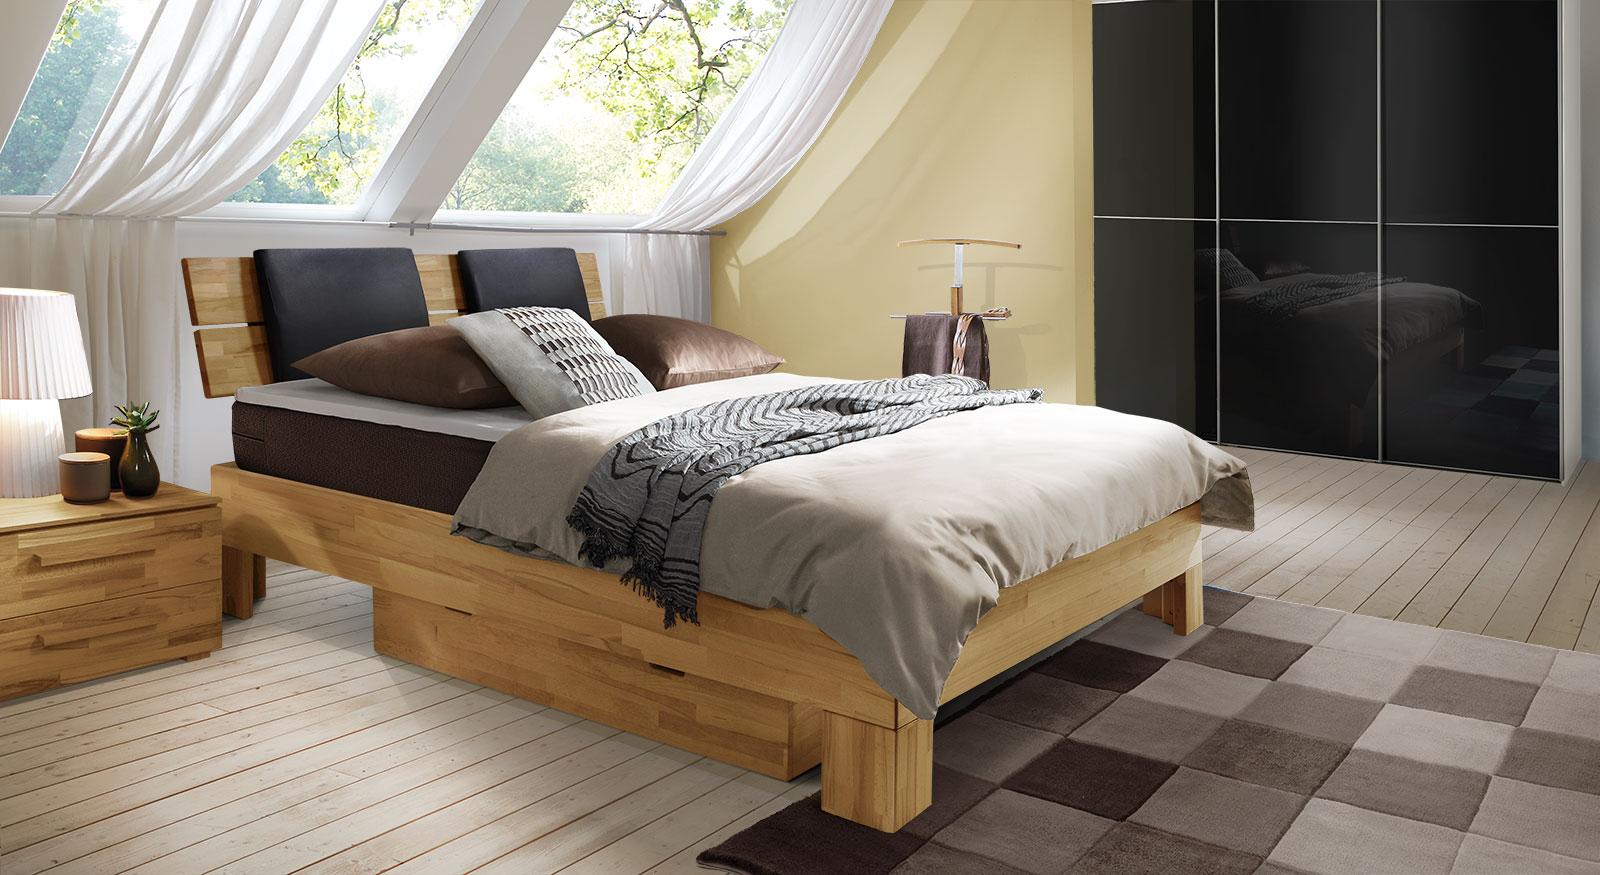 Komplett-Schlafzimmer mit Boxspringbett Port-Louis